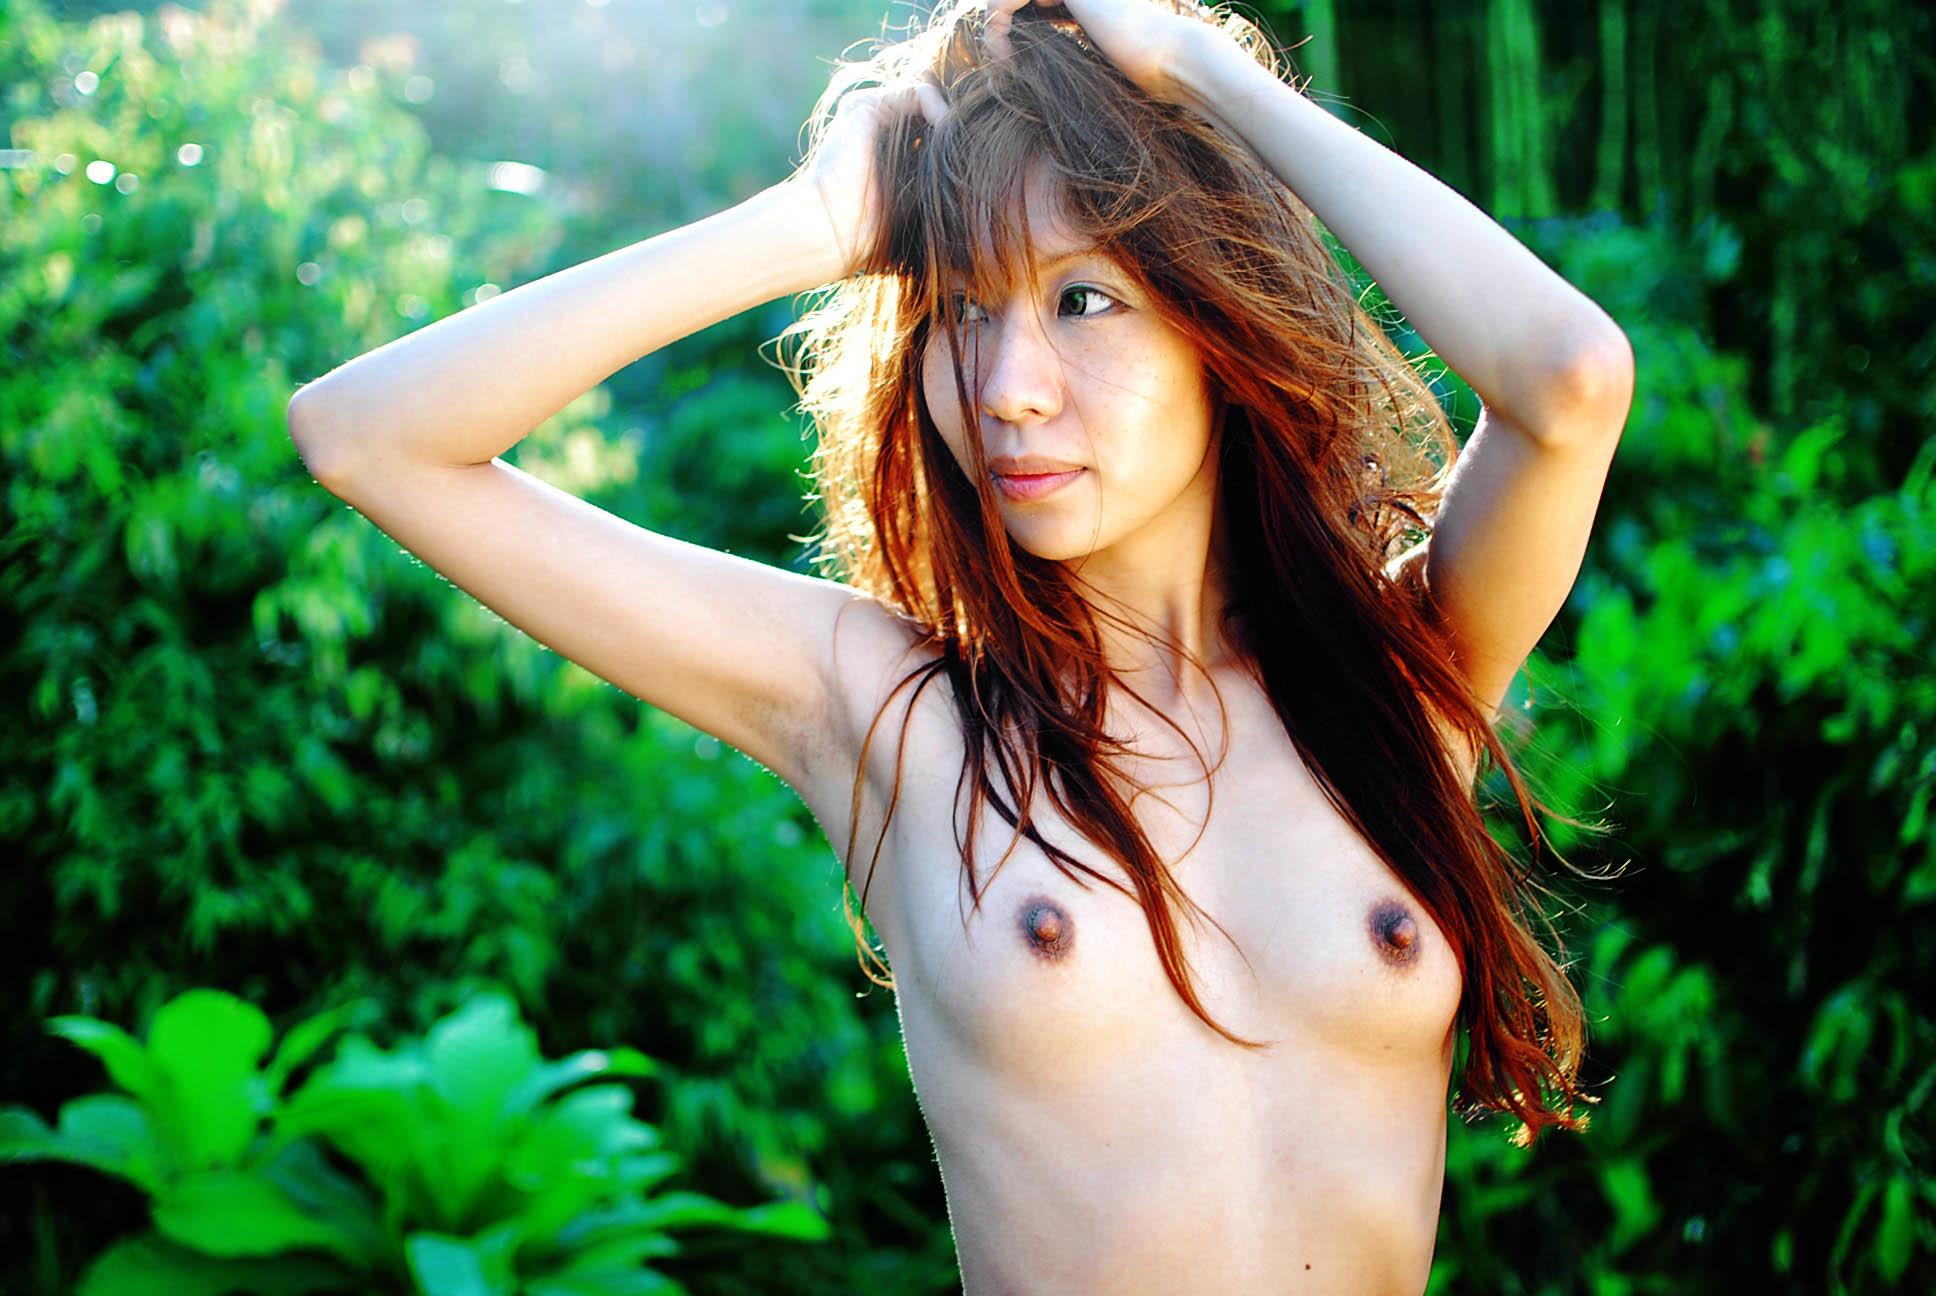 Девушка диджей из Сингапура Тенашар